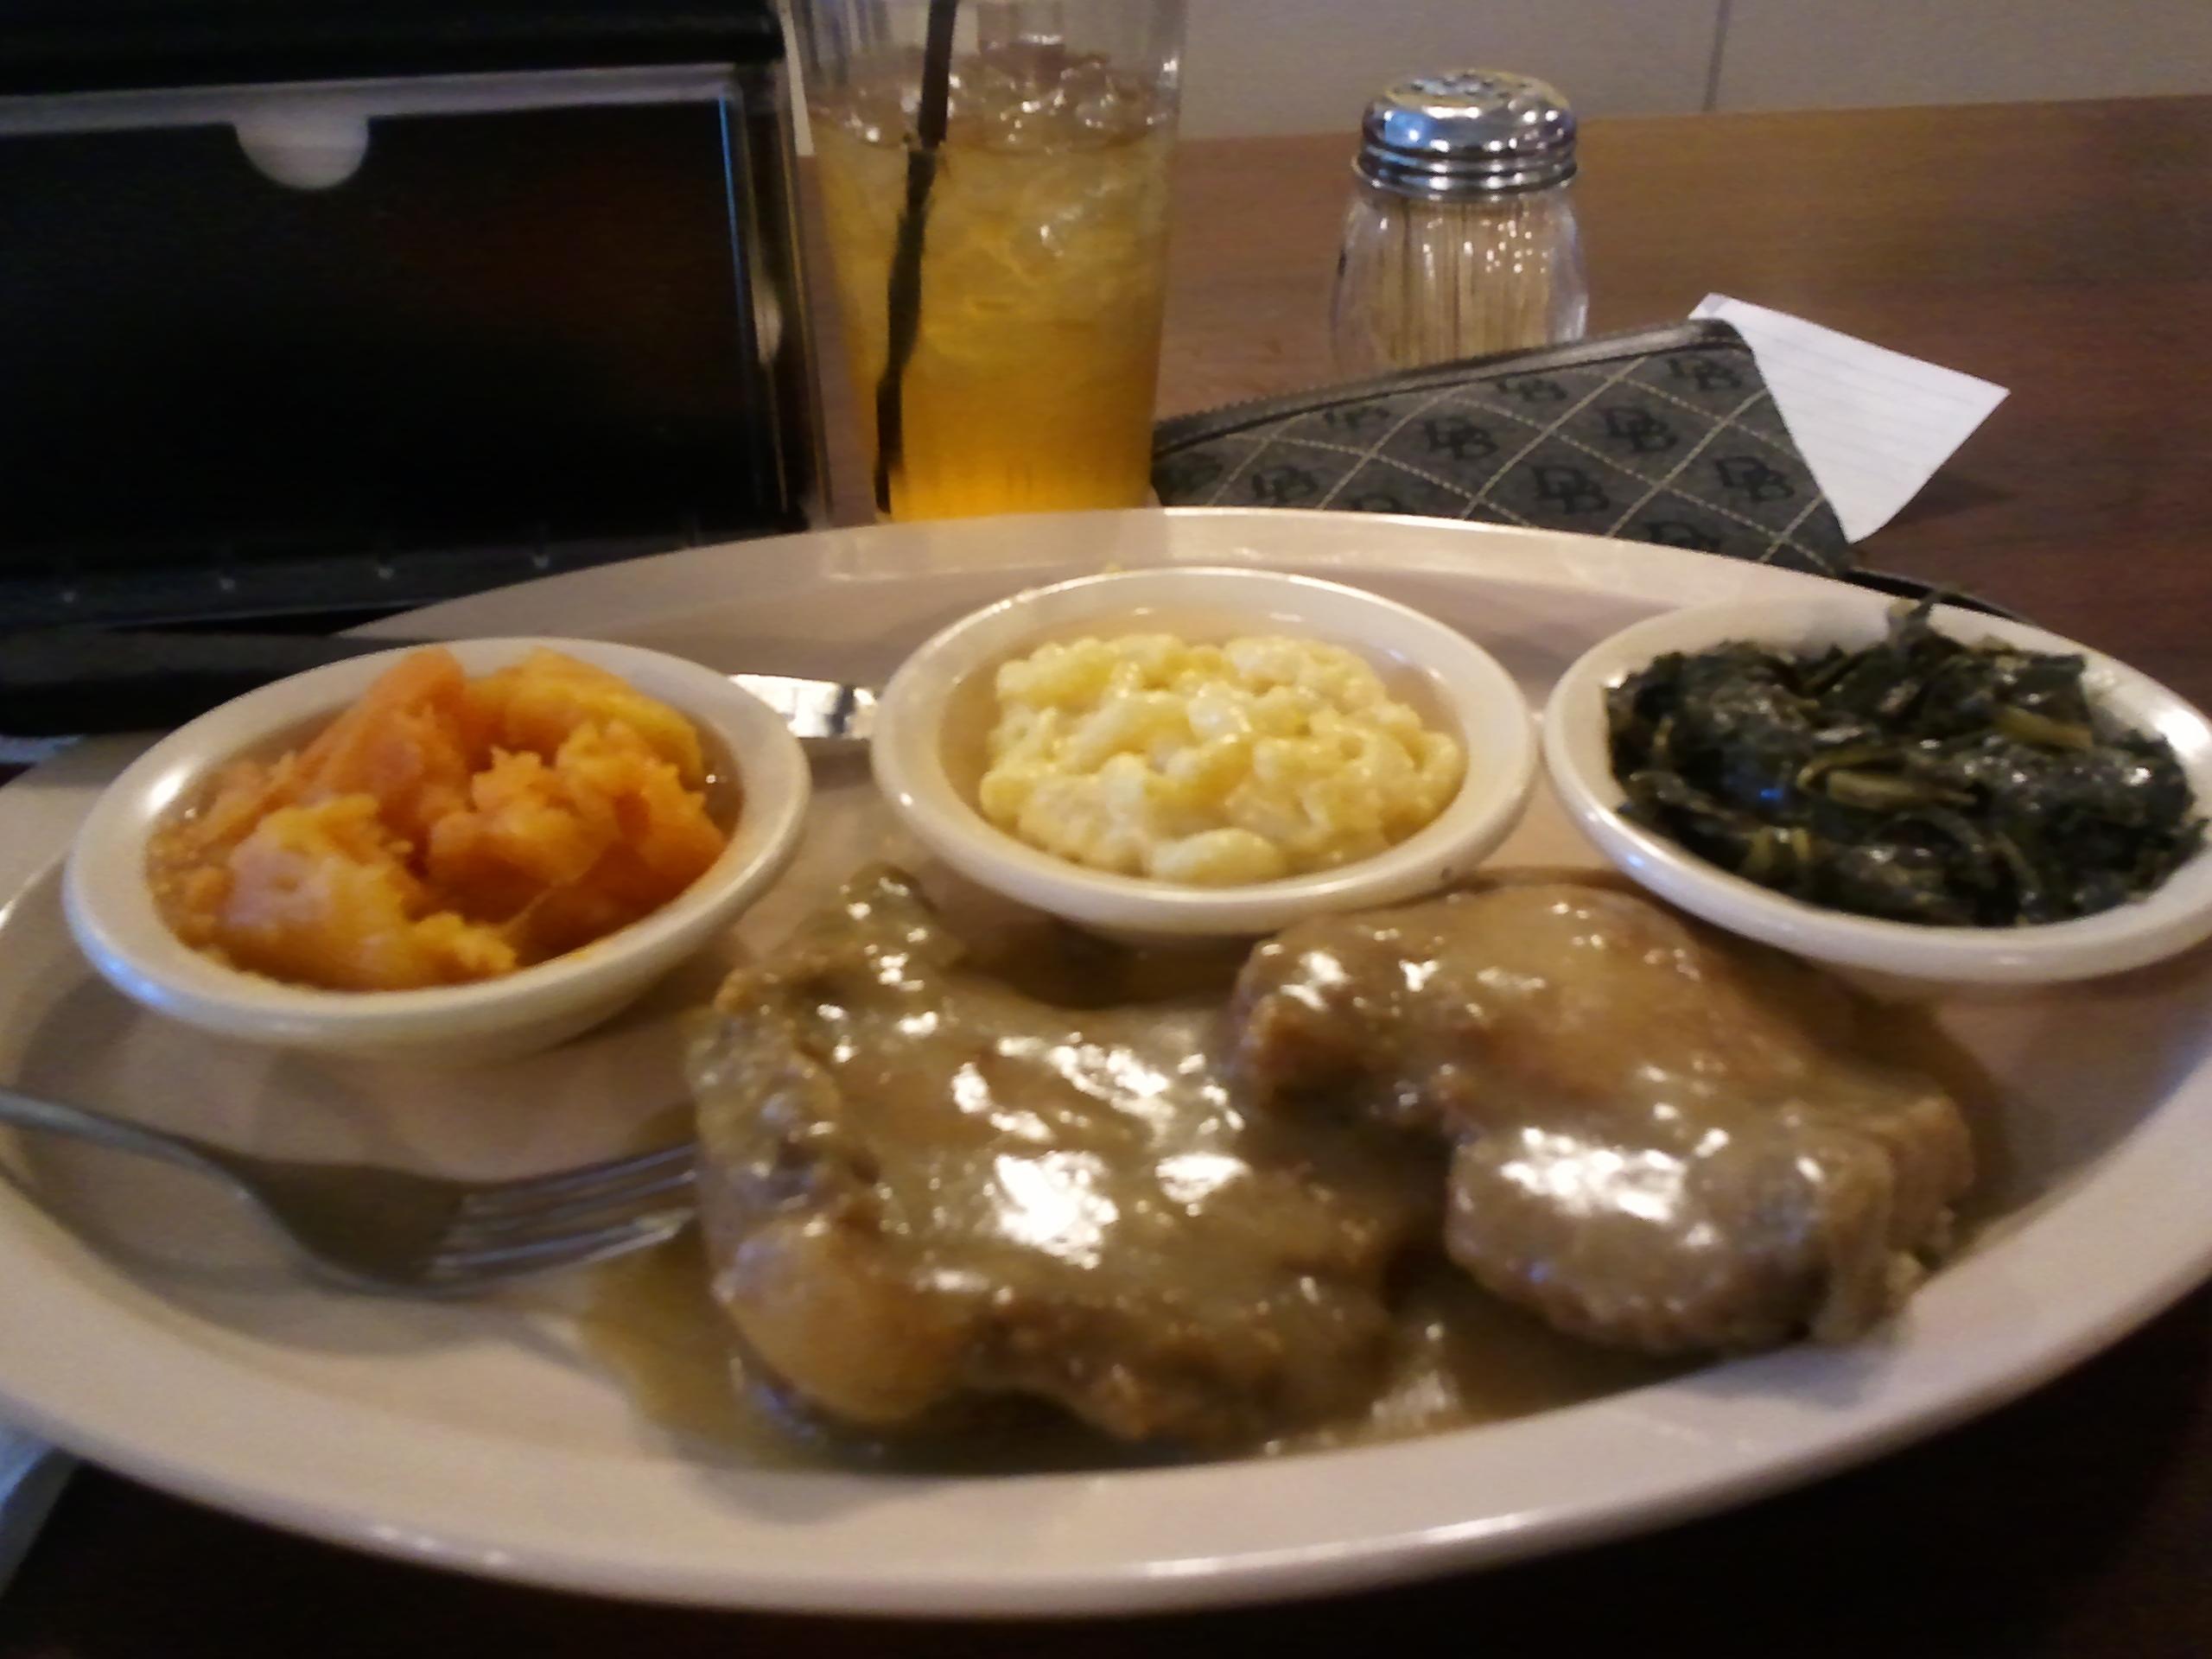 Busy Bee Cafe', Atlanta, GA :: Smothered Pork Chops w/Collards, Mac & Chz, Candied Yams, and Cornbread